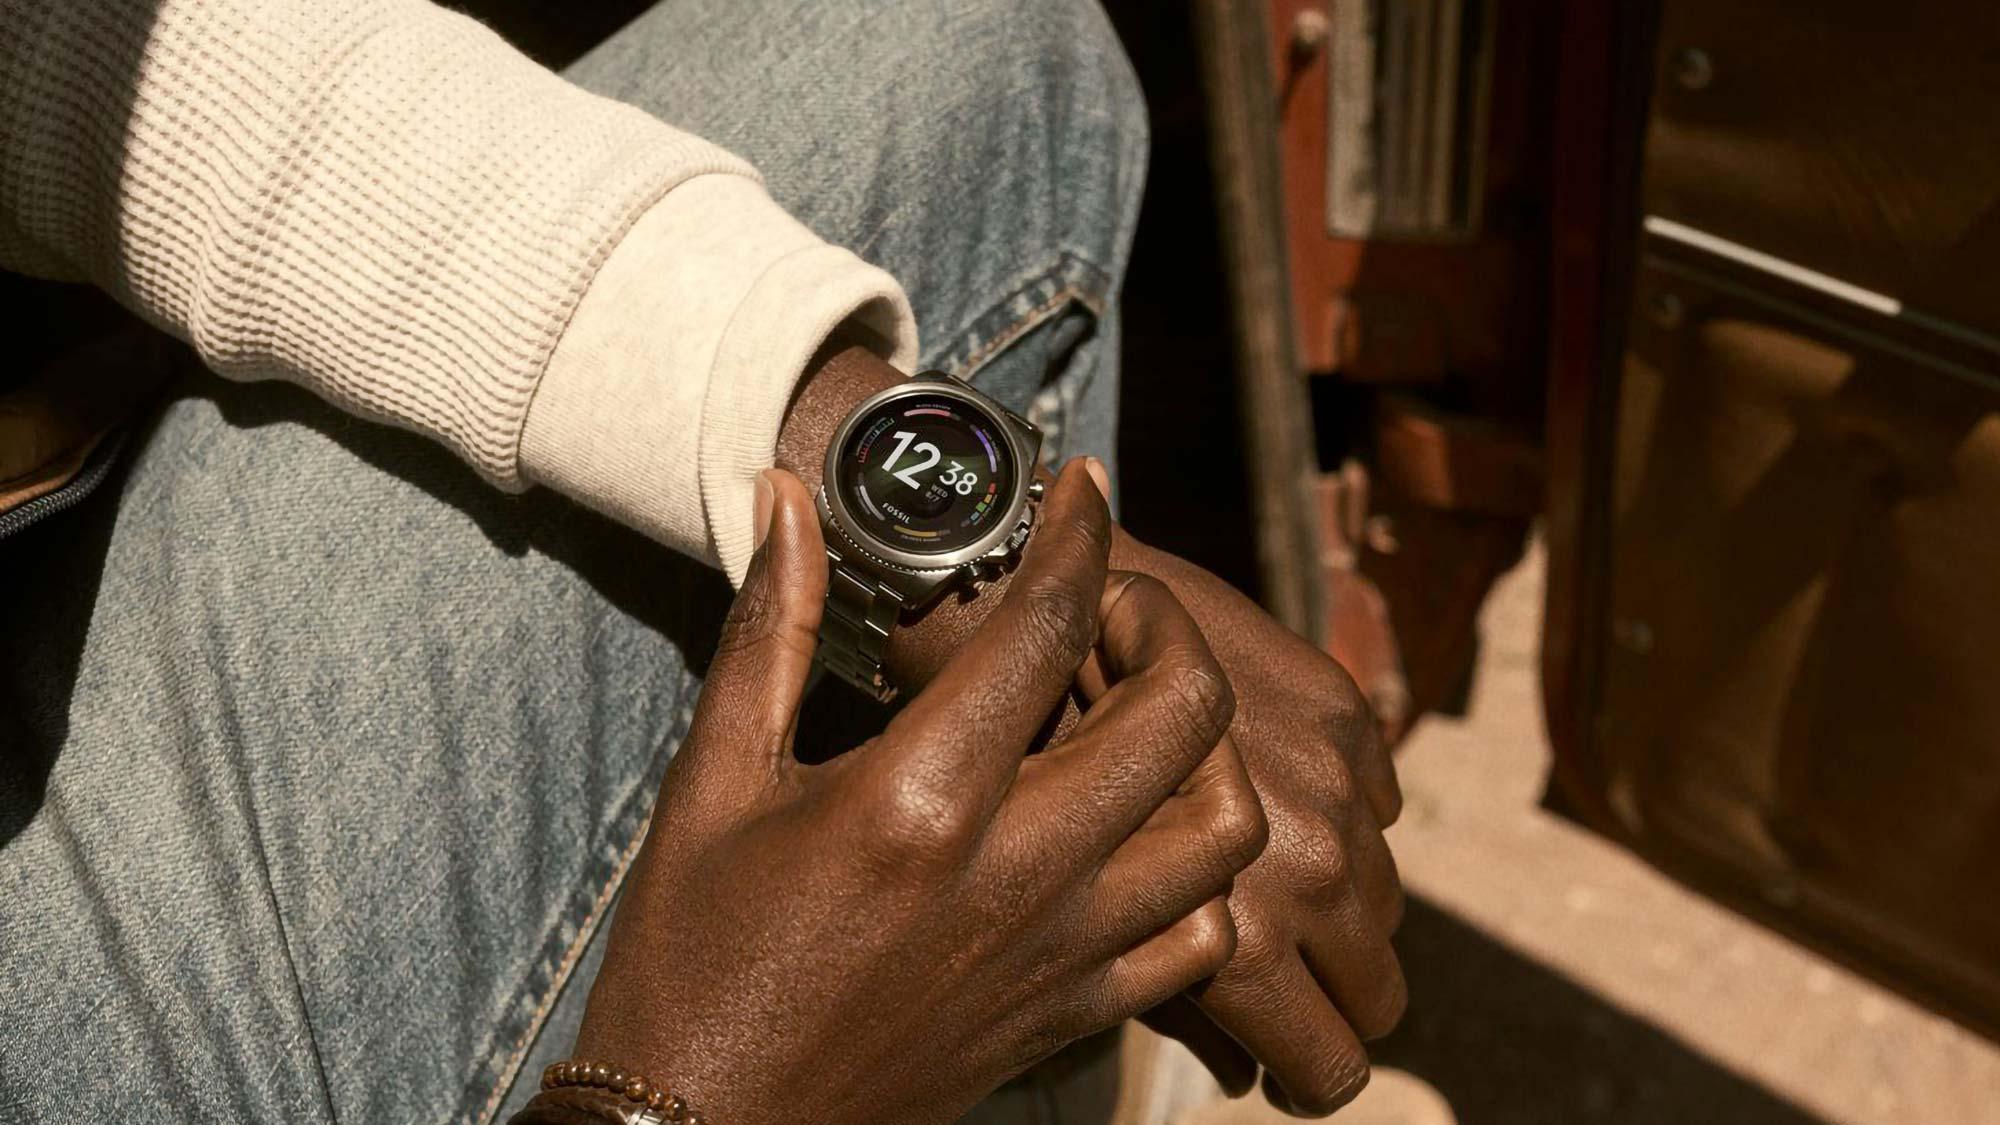 2021 Fossil Gen 6 Smartwatch